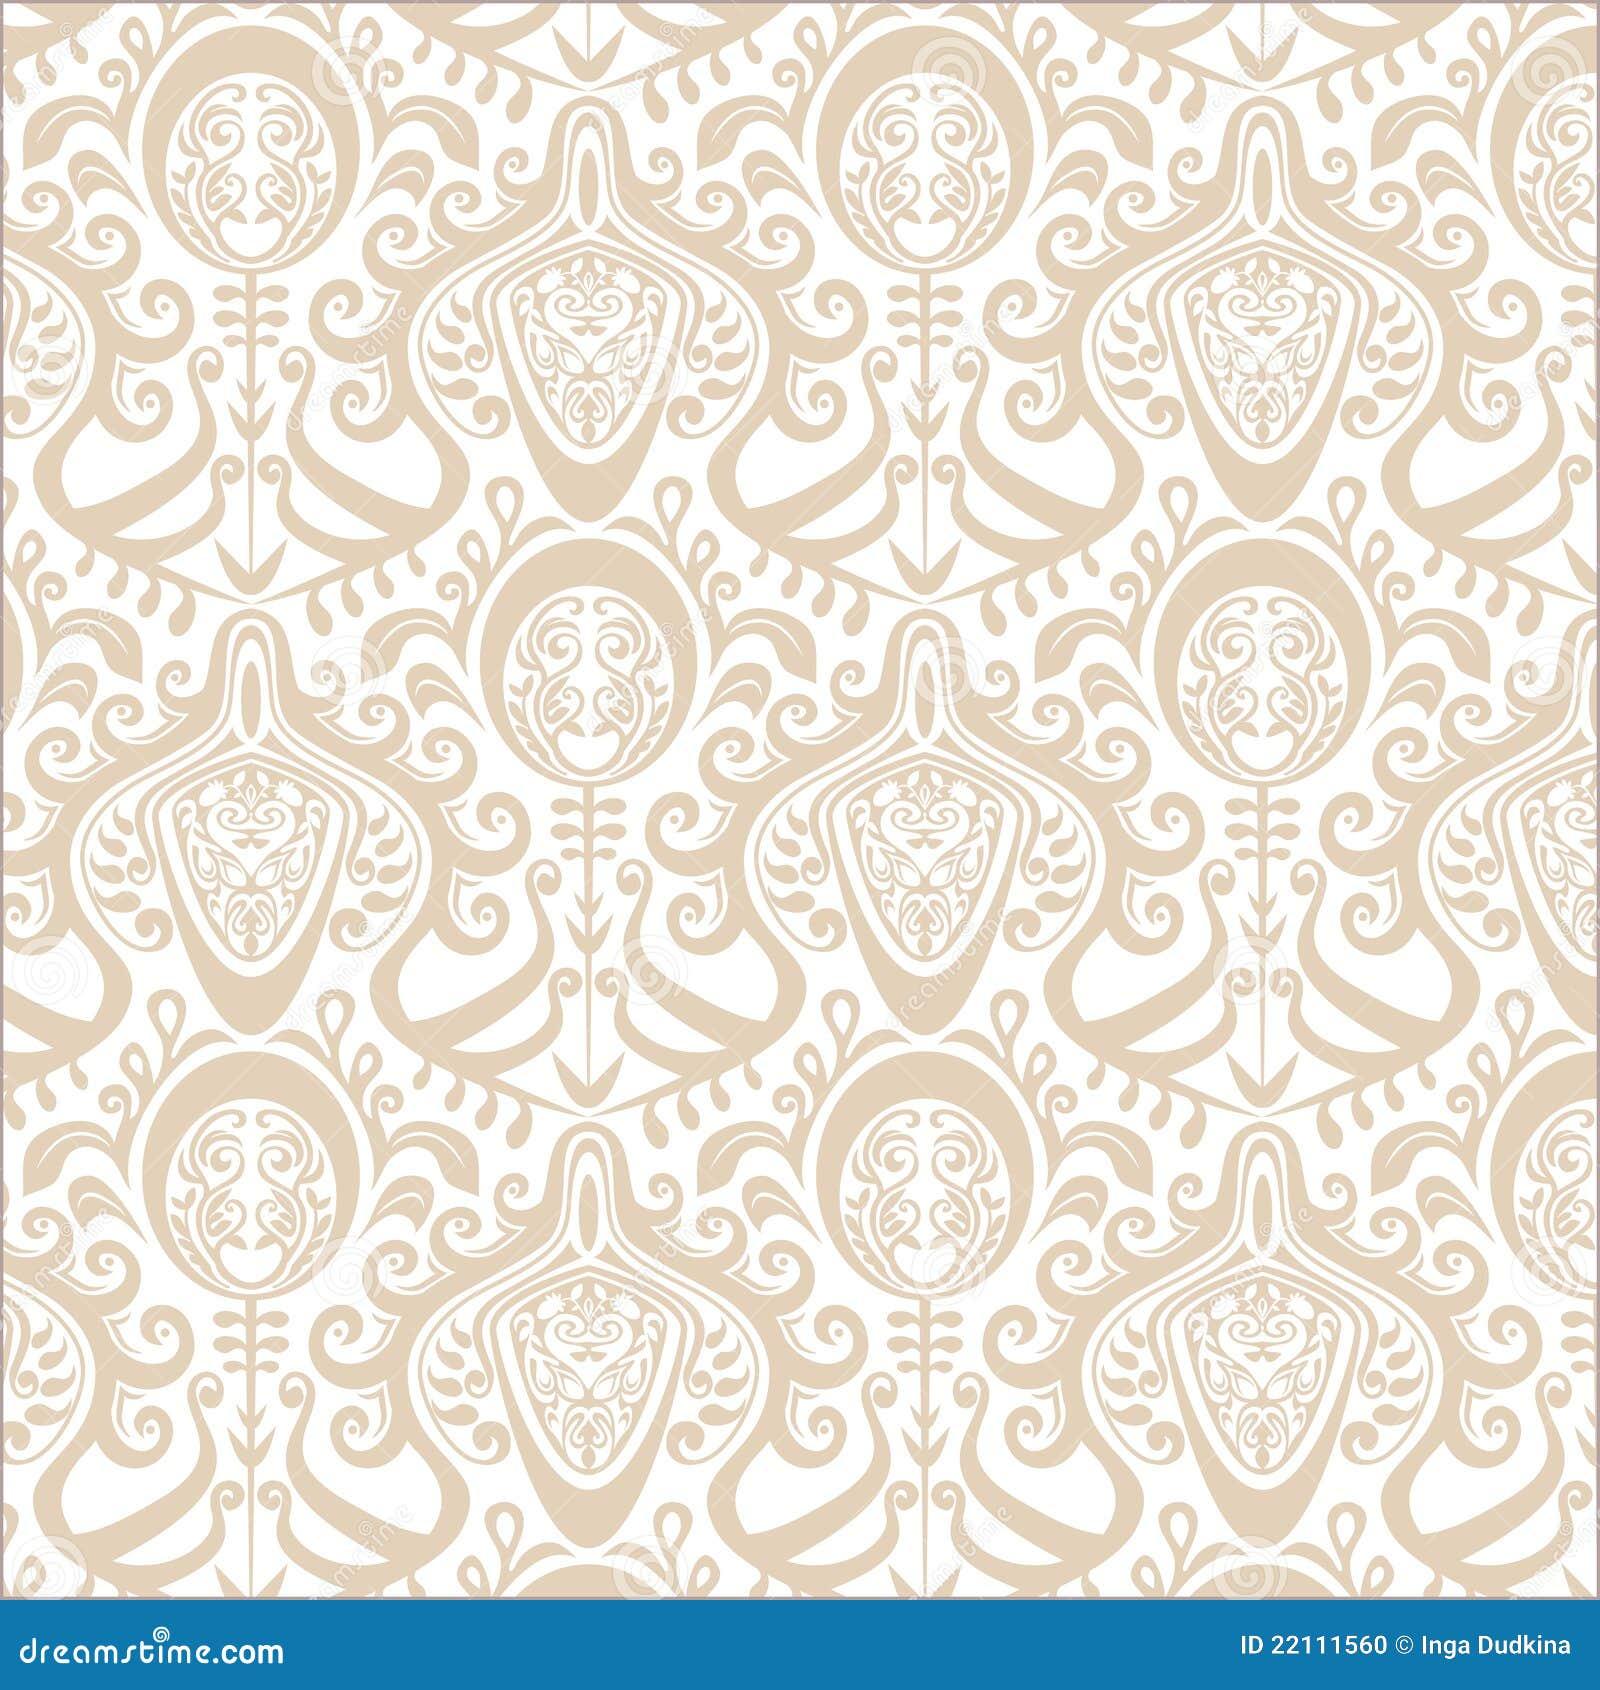 Vintage Wallpaper Pattern. Stock Photo